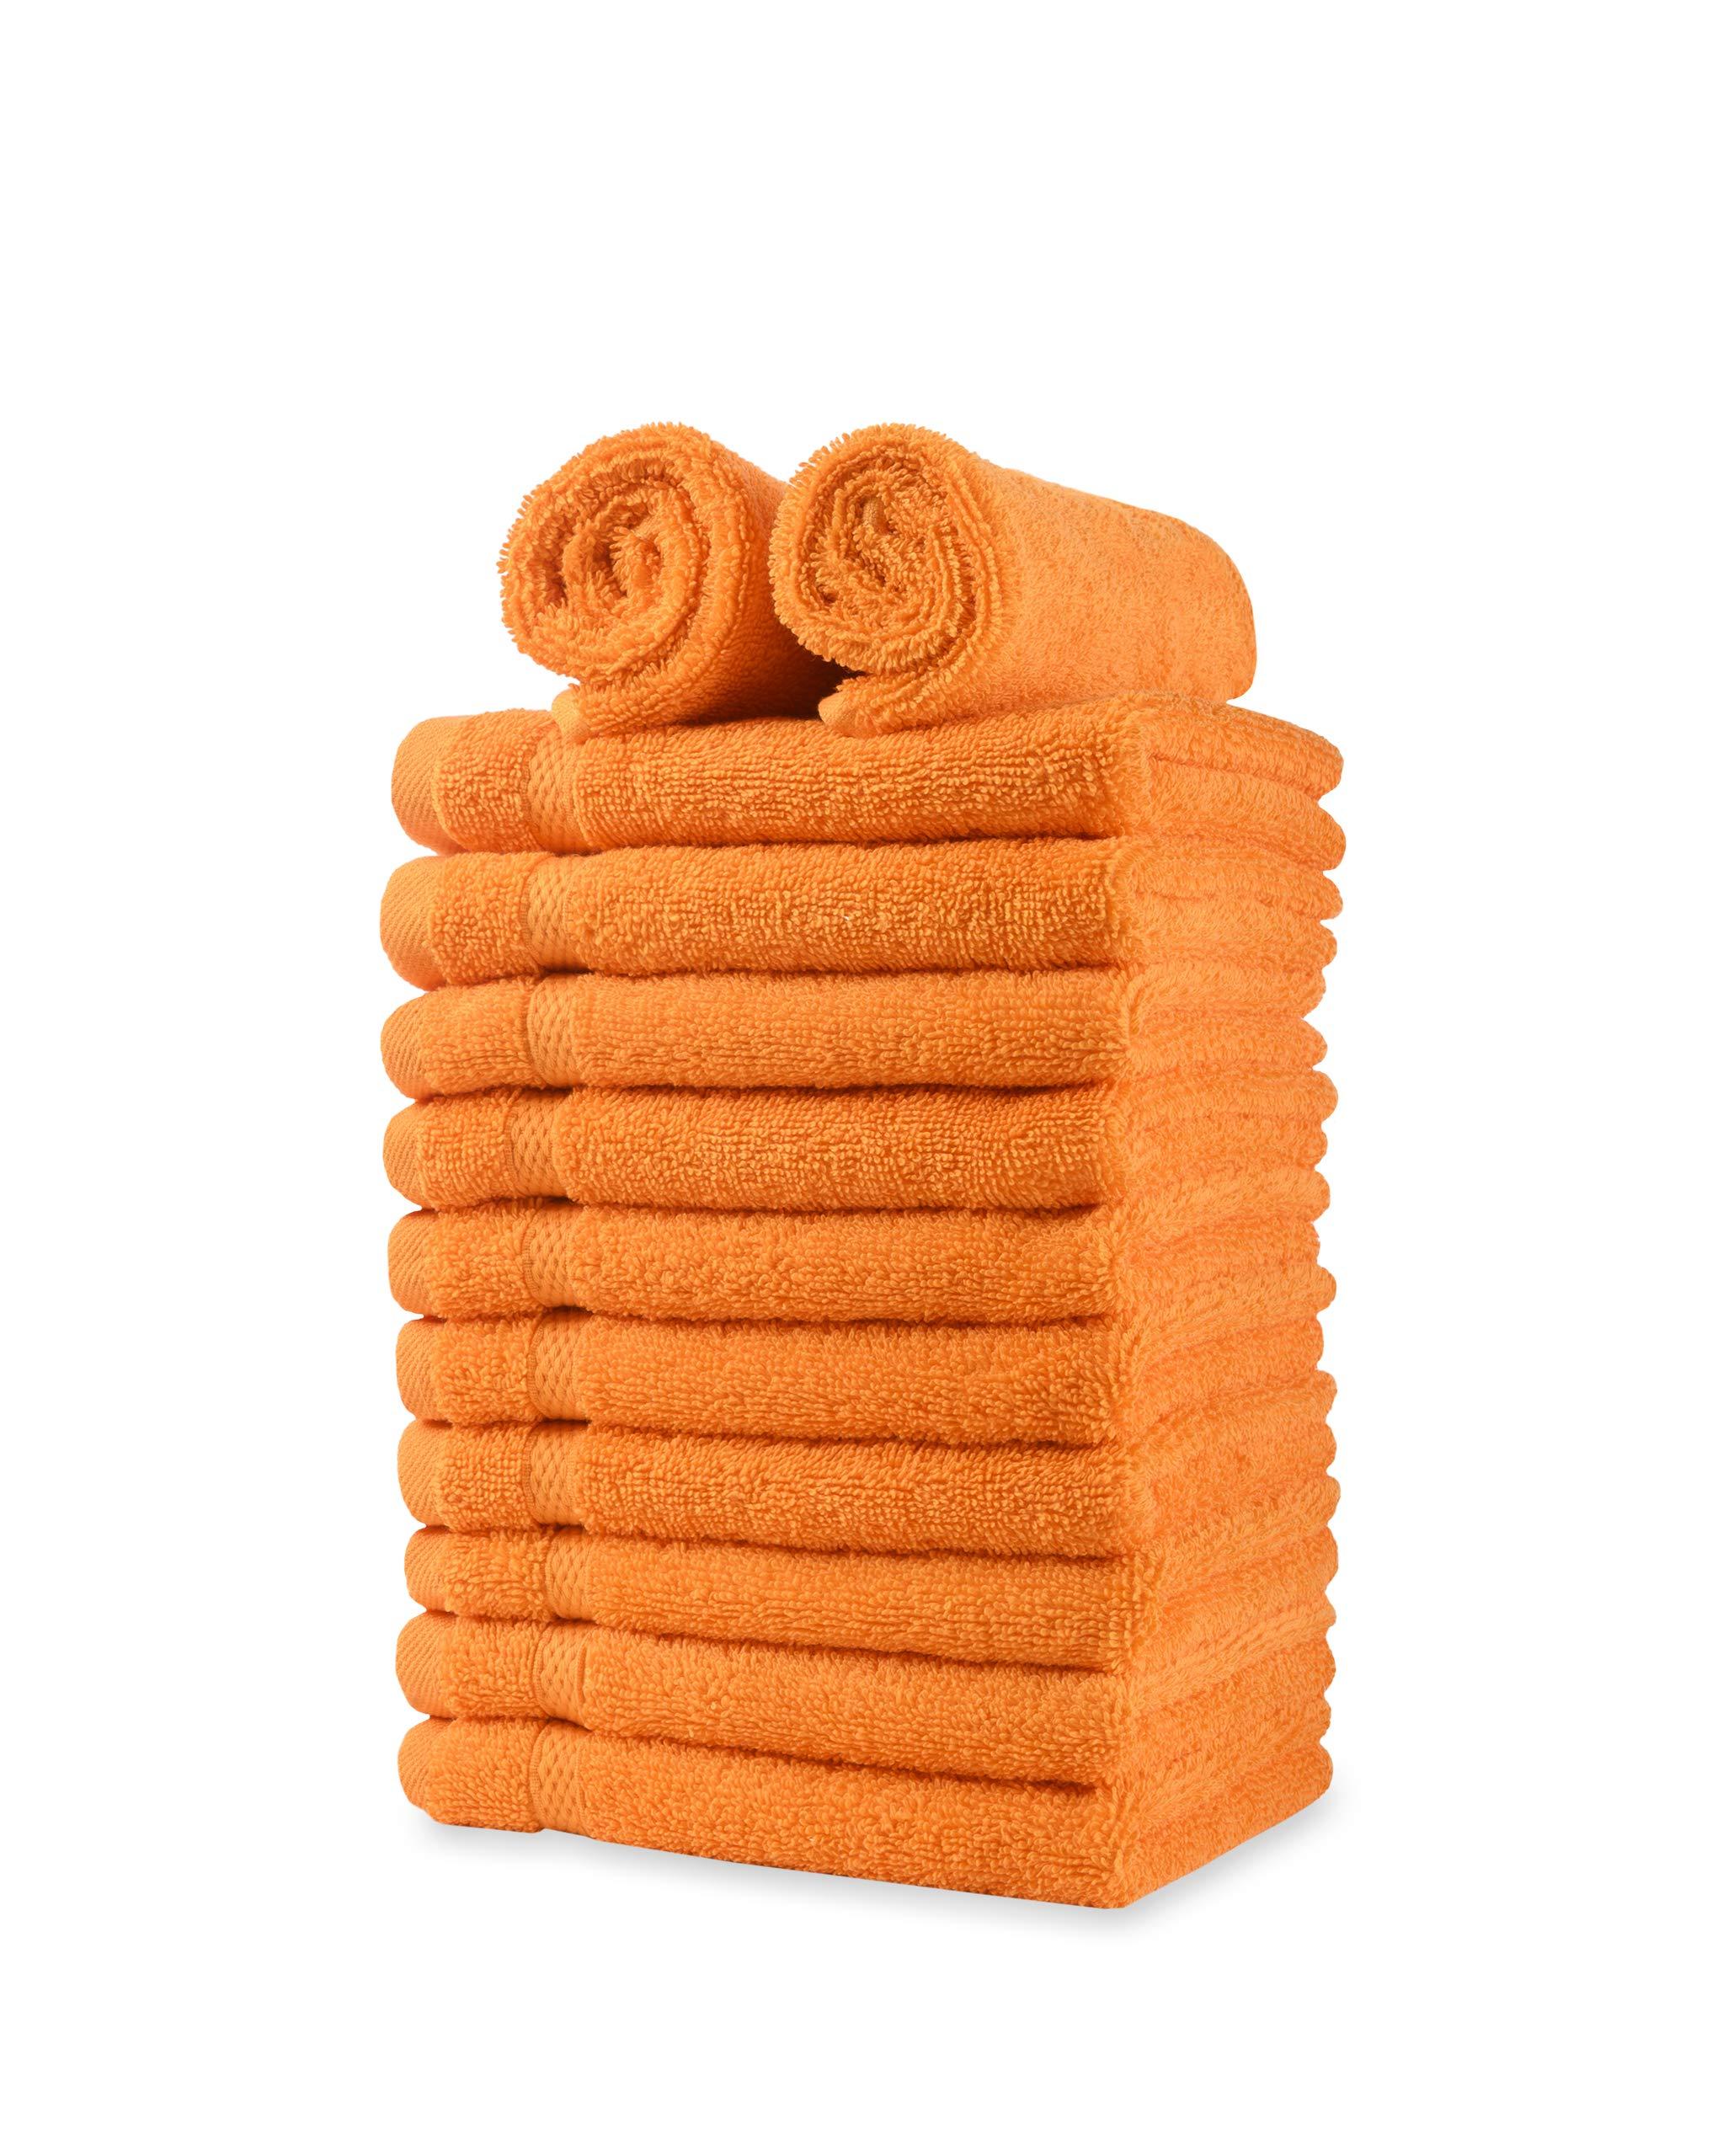 Payam Collection Premium Turkish Towels (Orange)